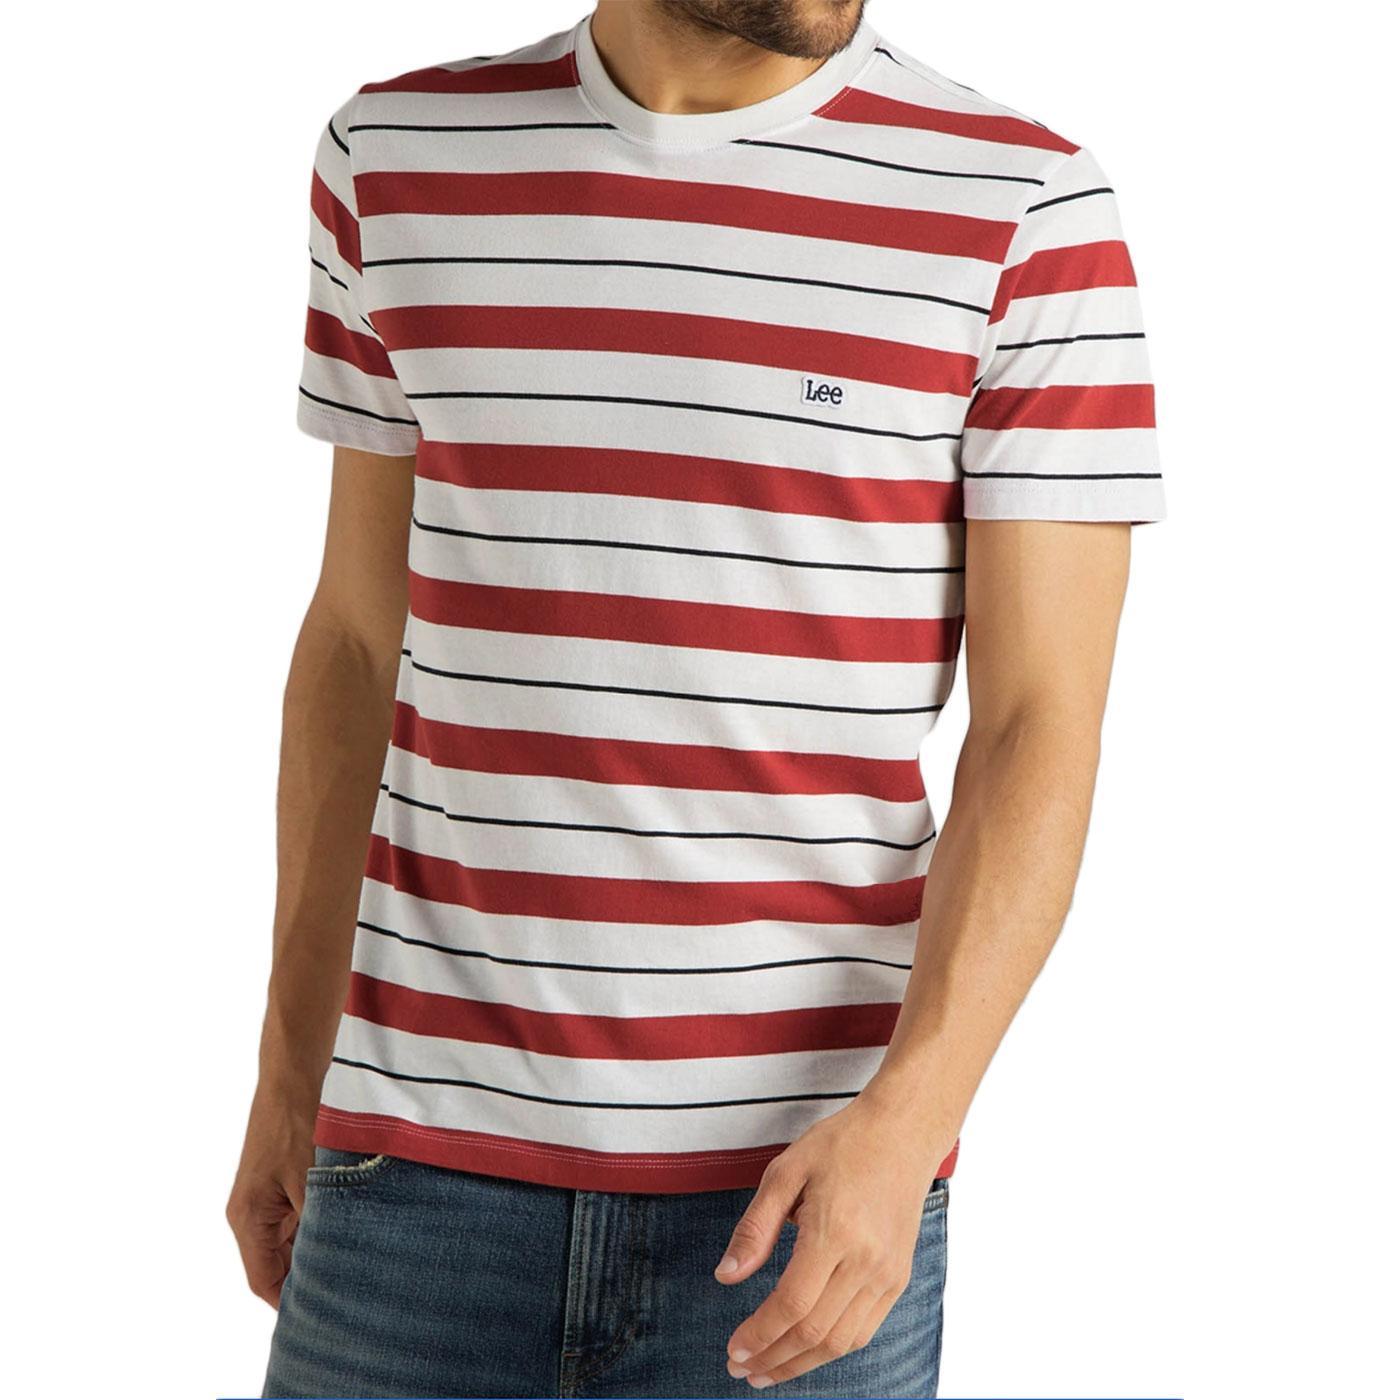 LEE Men's Retro Mod Multi Stripe Tee (Red/White)